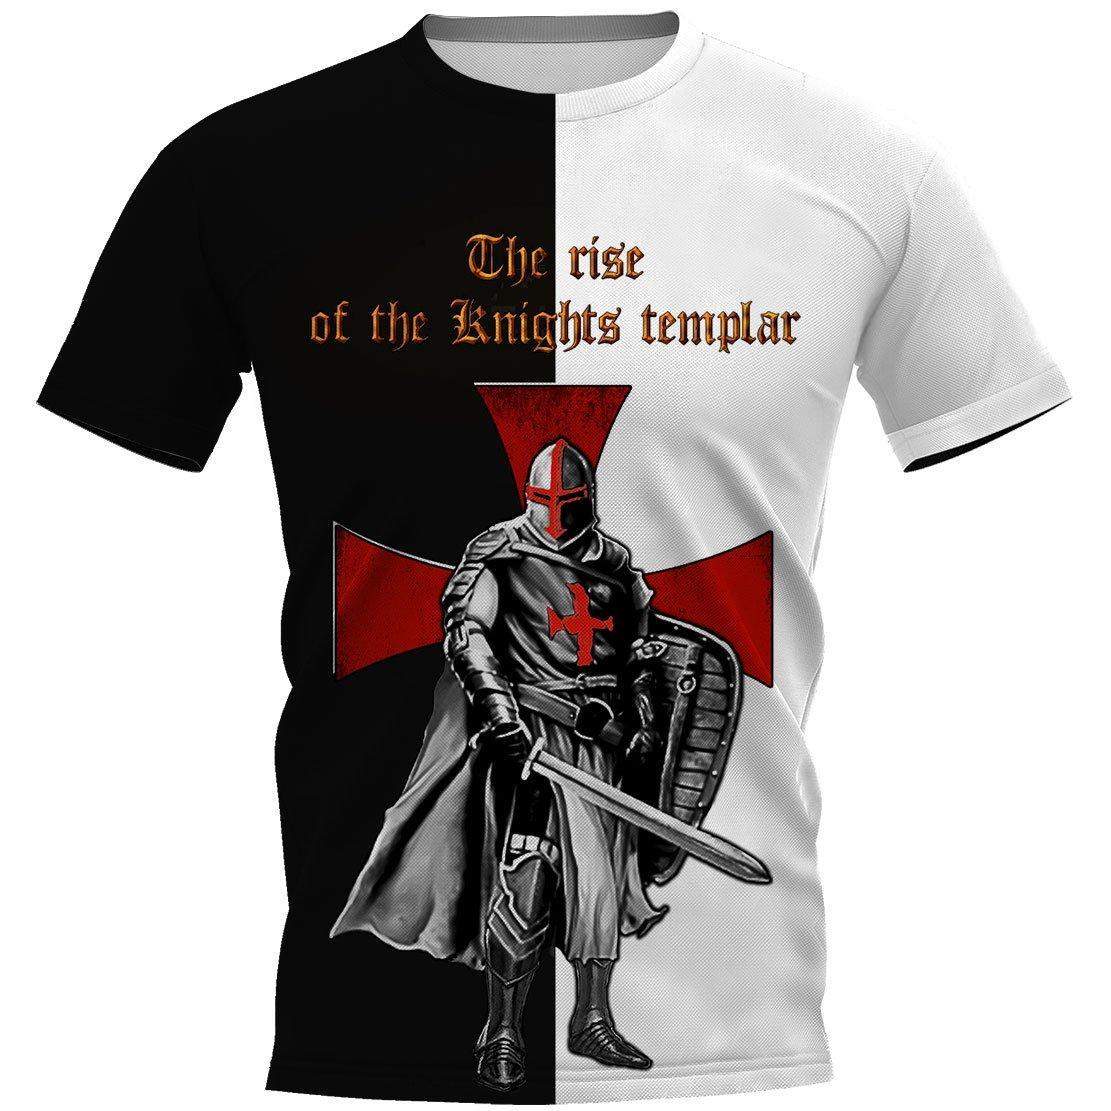 Knights templar the rise of the knight templar 3d full printing unisex tee